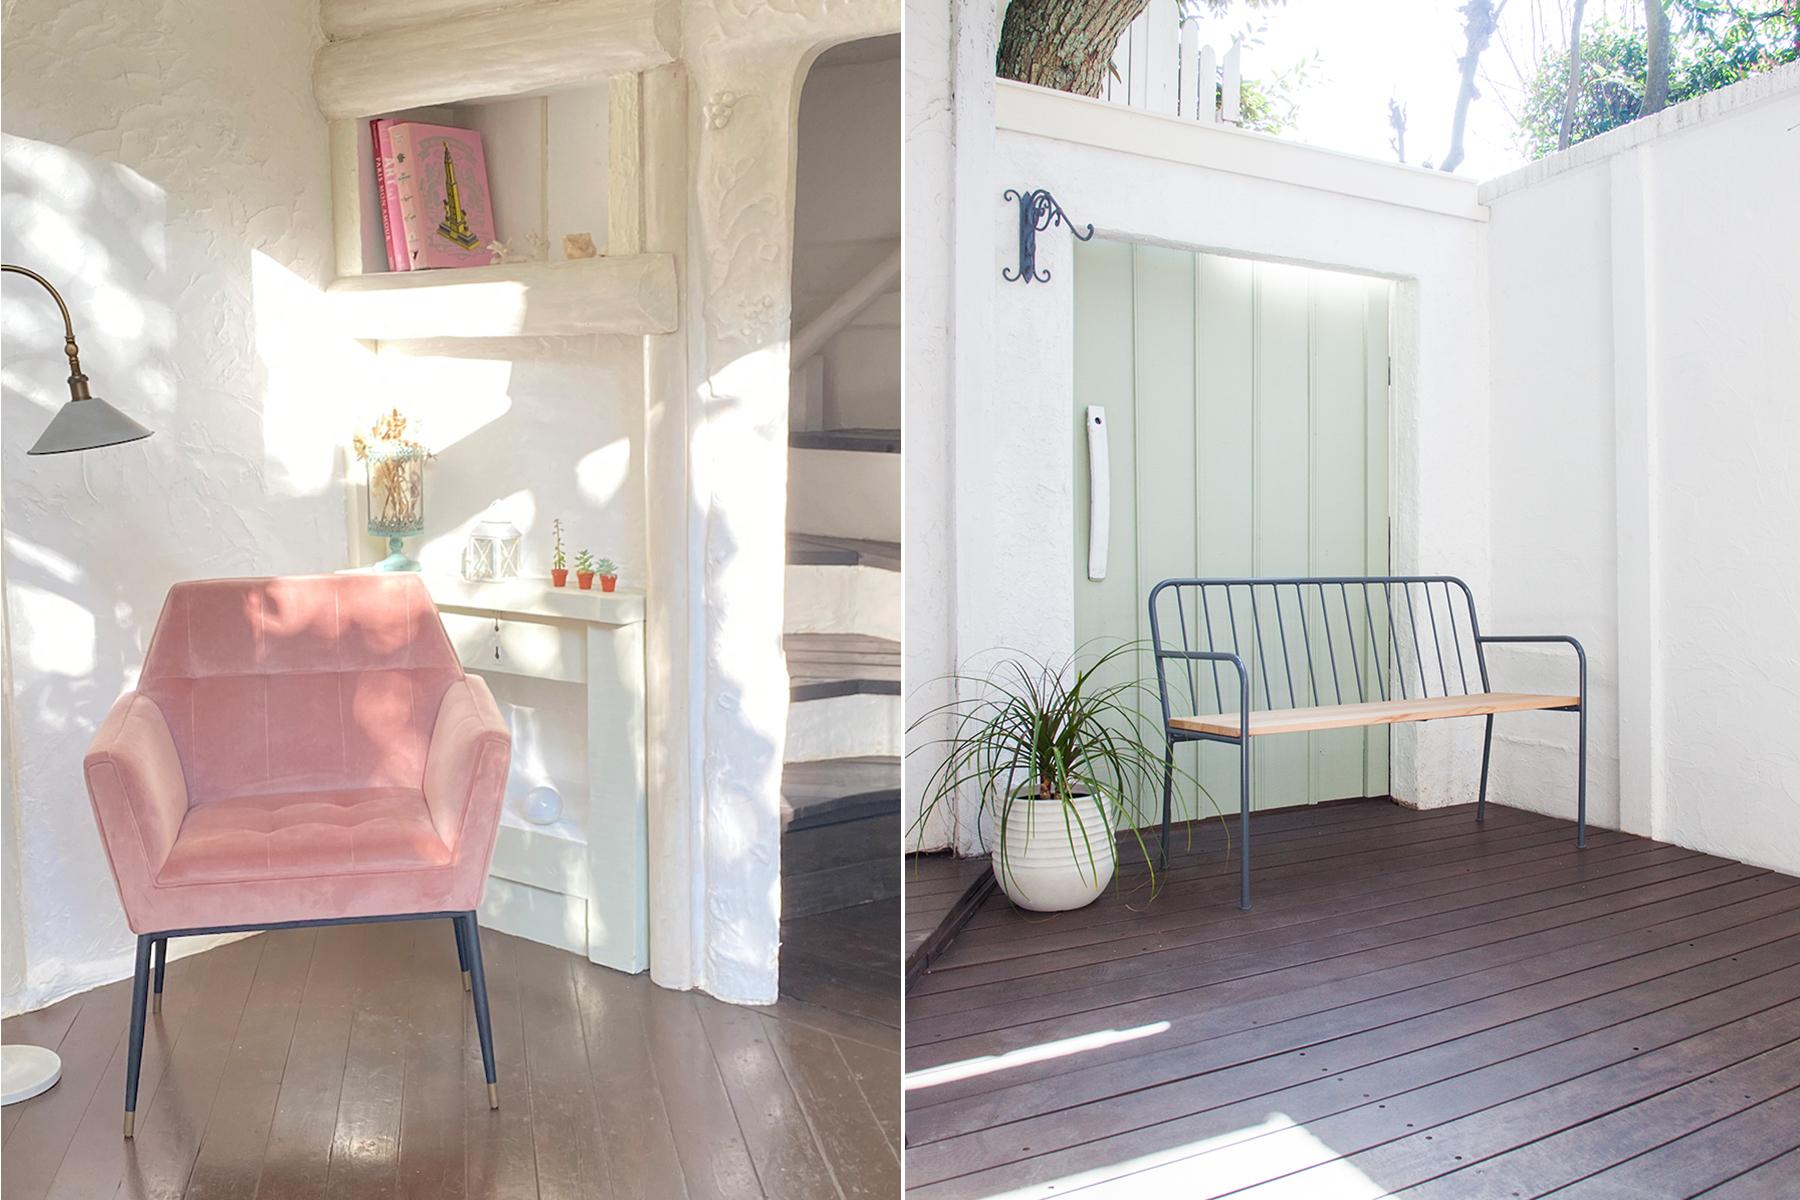 Rapture Studio (ラプチャースタジオ)ピンクの壁・天蓋・長椅子